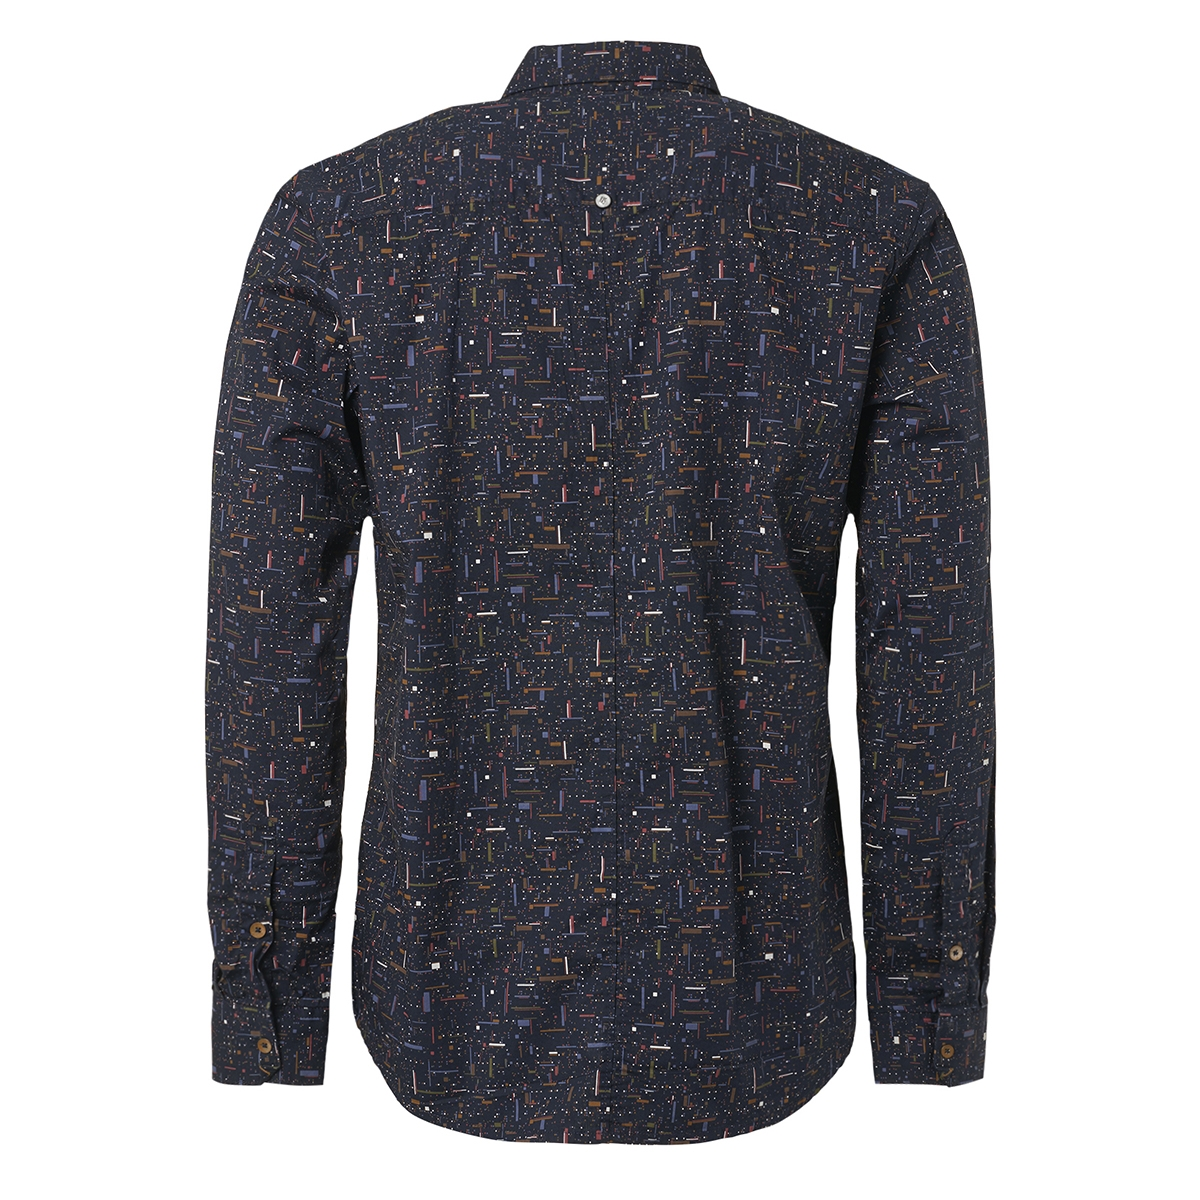 87450901s no-excess overhemd 078 night